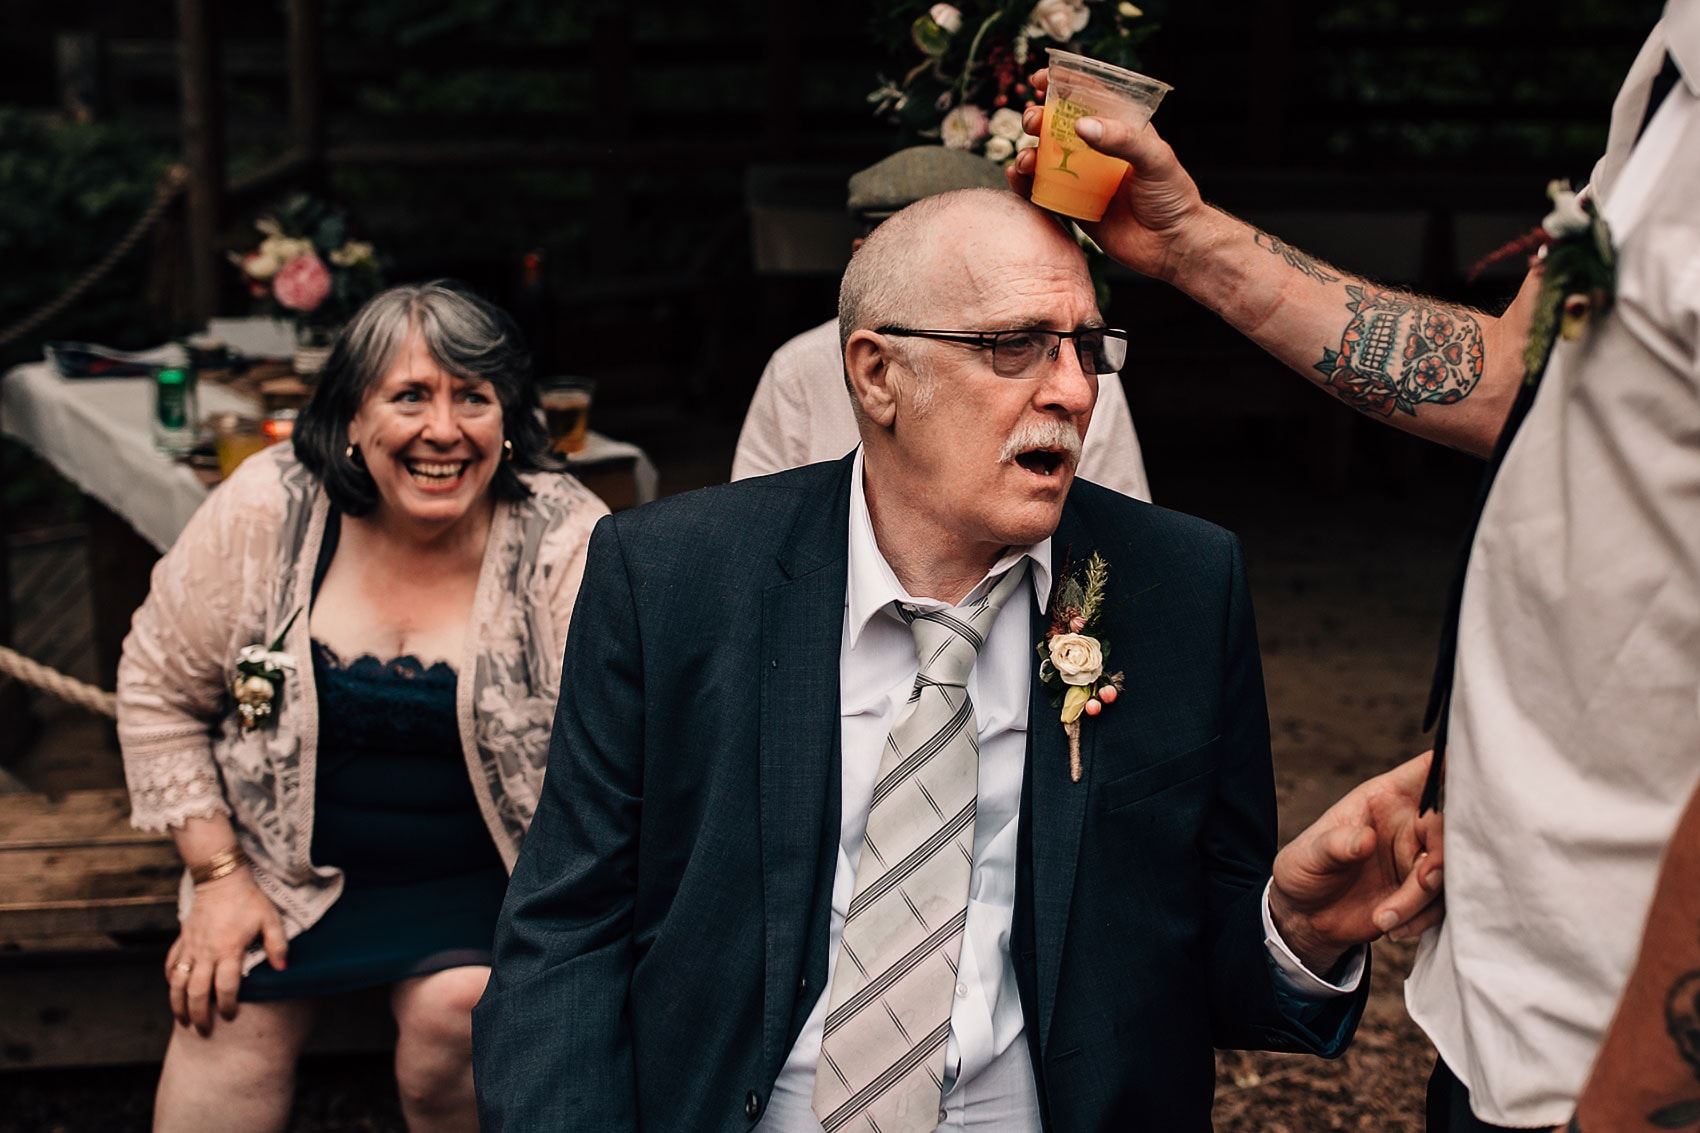 wedding guests rustic outdoor wedding photography